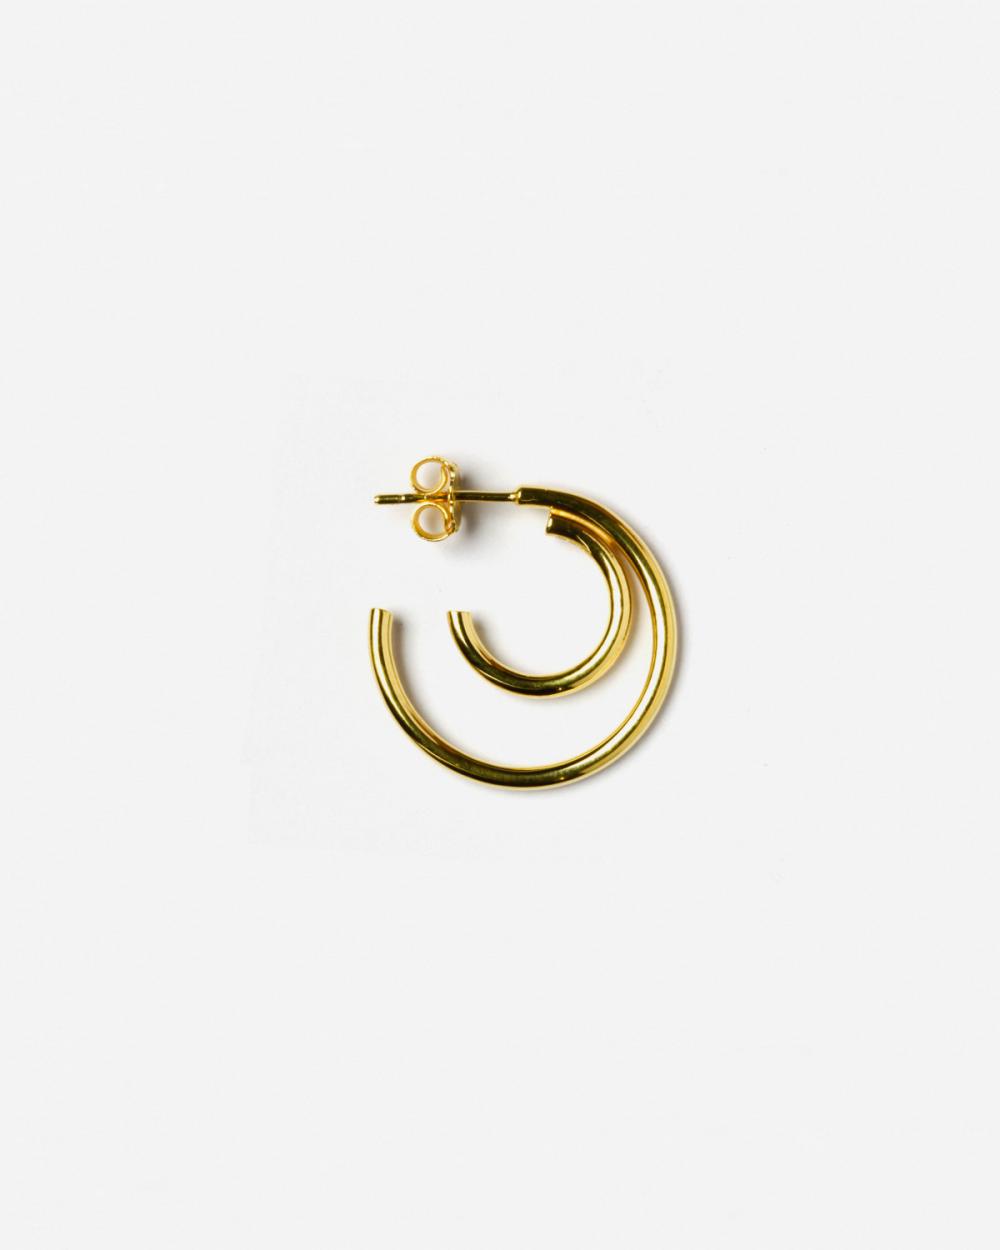 Earrings YELLOW GOLD NU SINGLE EARRING NOVE25